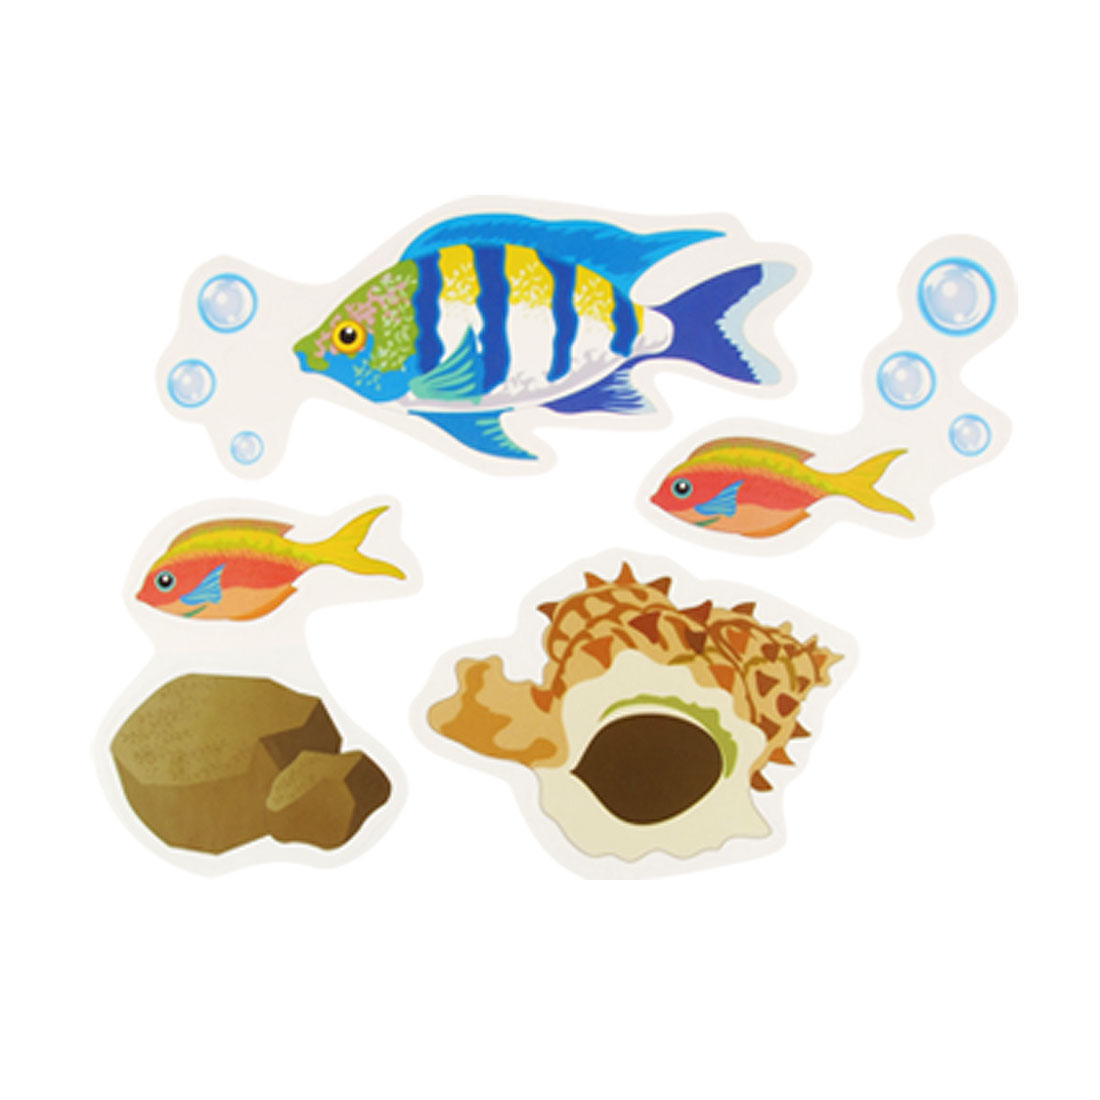 Art Wall Paper Adhesive Sticker Sea World Fish Decals 4 Pcs